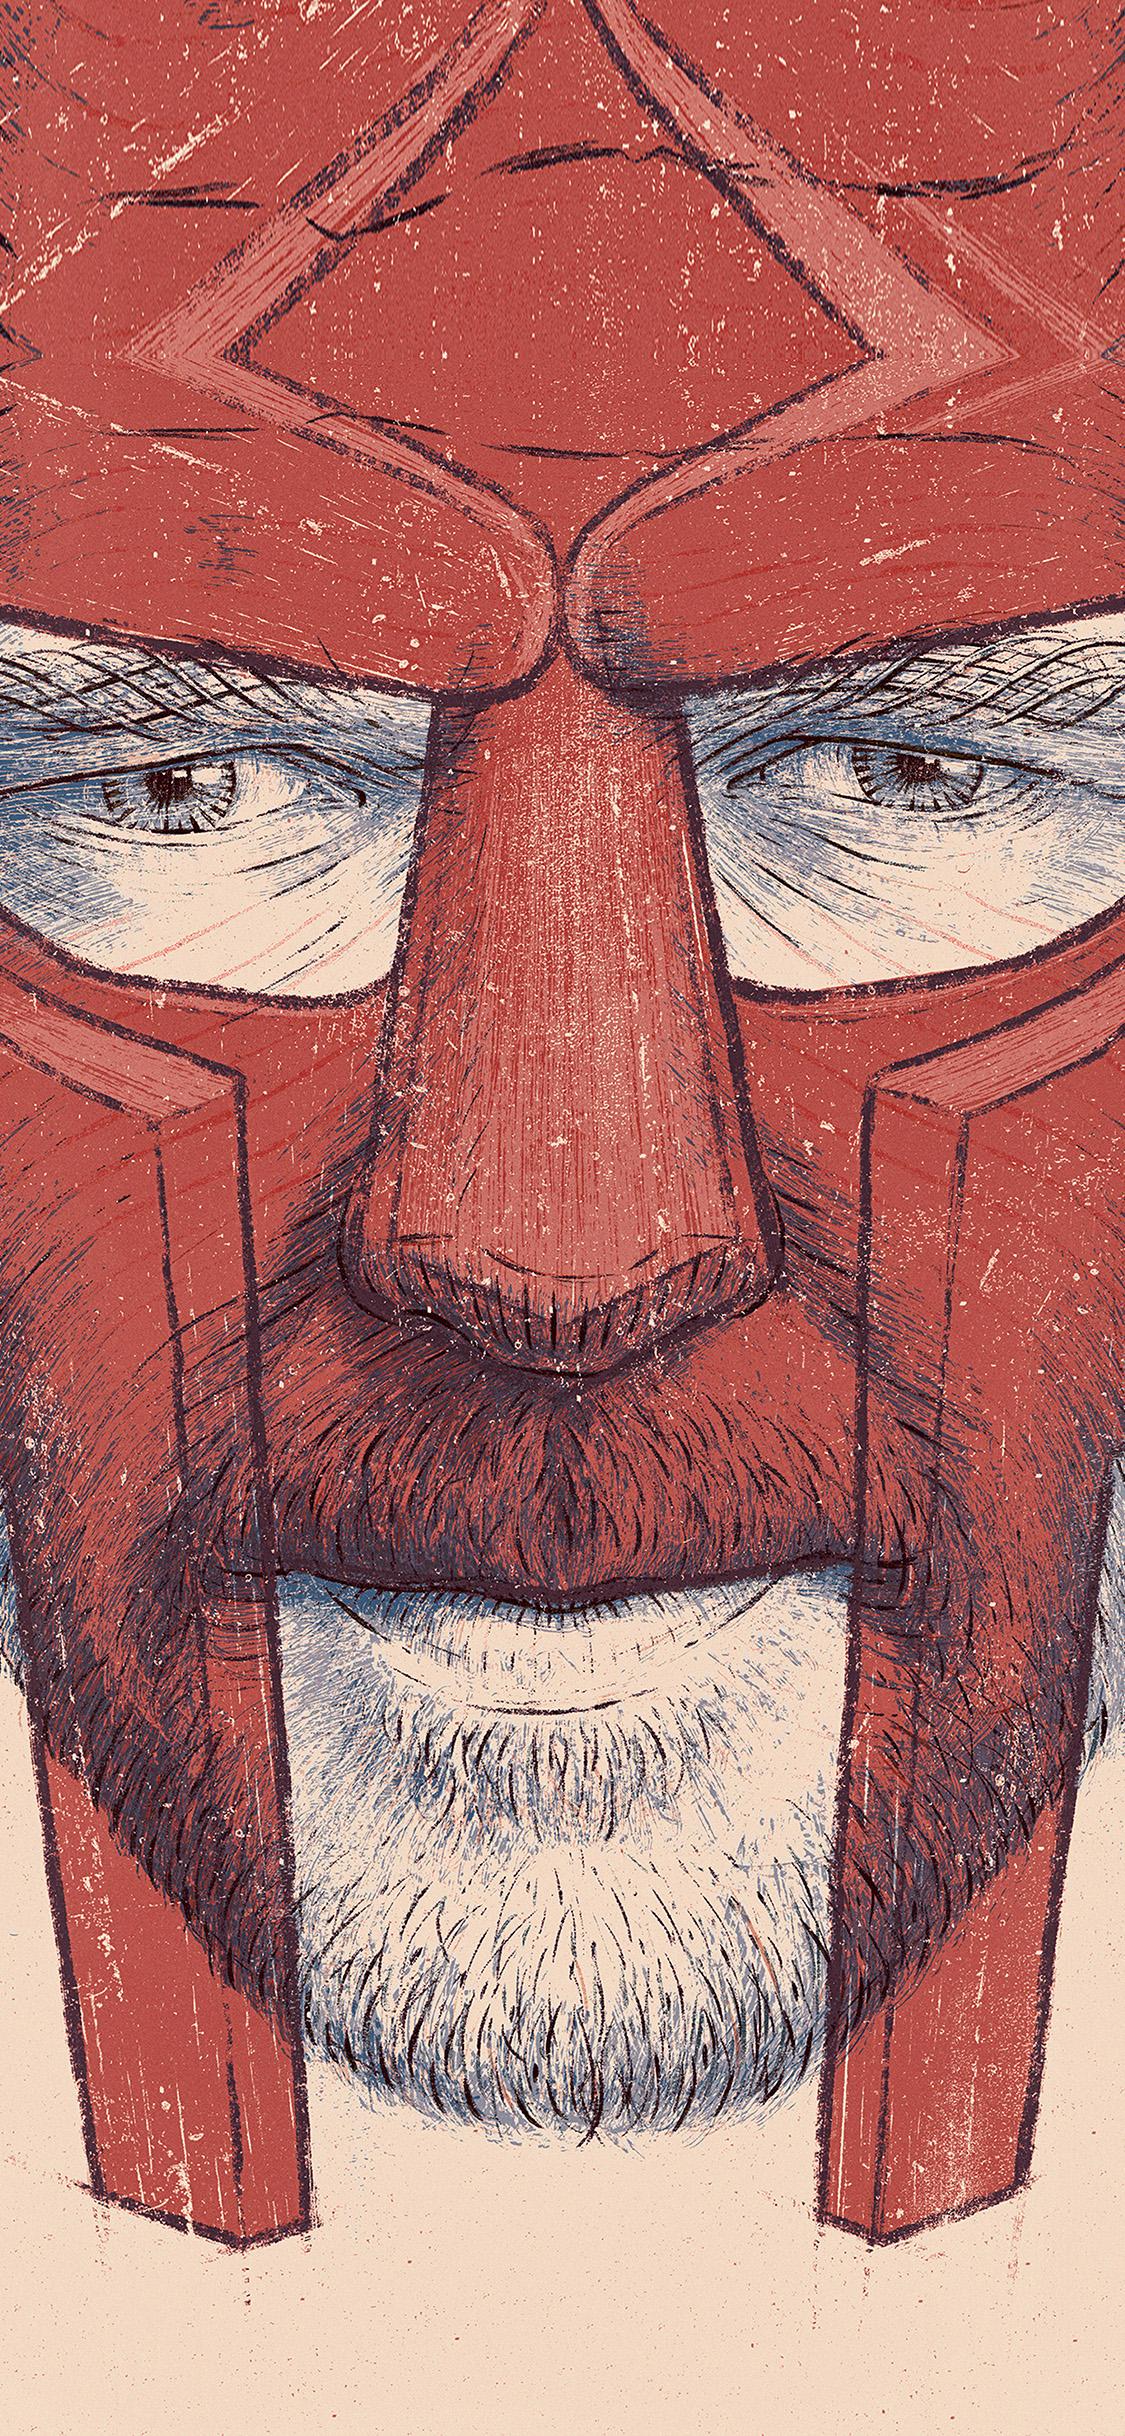 iPhonexpapers.com-Apple-iPhone-wallpaper-bg01-gladiator-anime-illustration-red-art